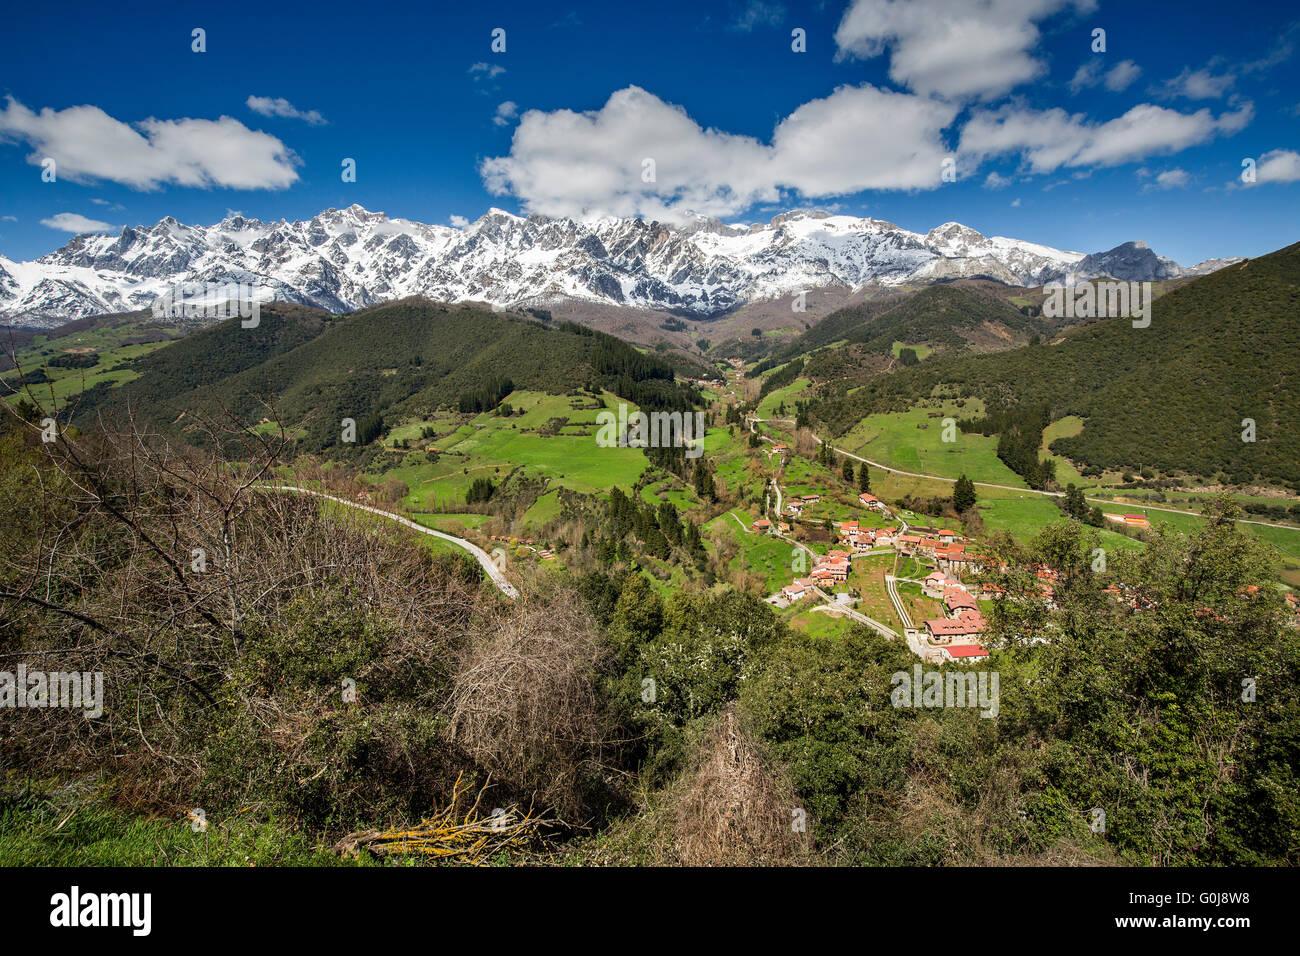 Turieno village. Liébana region, Picos de Europa, Cantabria  Spain, Europe - Stock Image